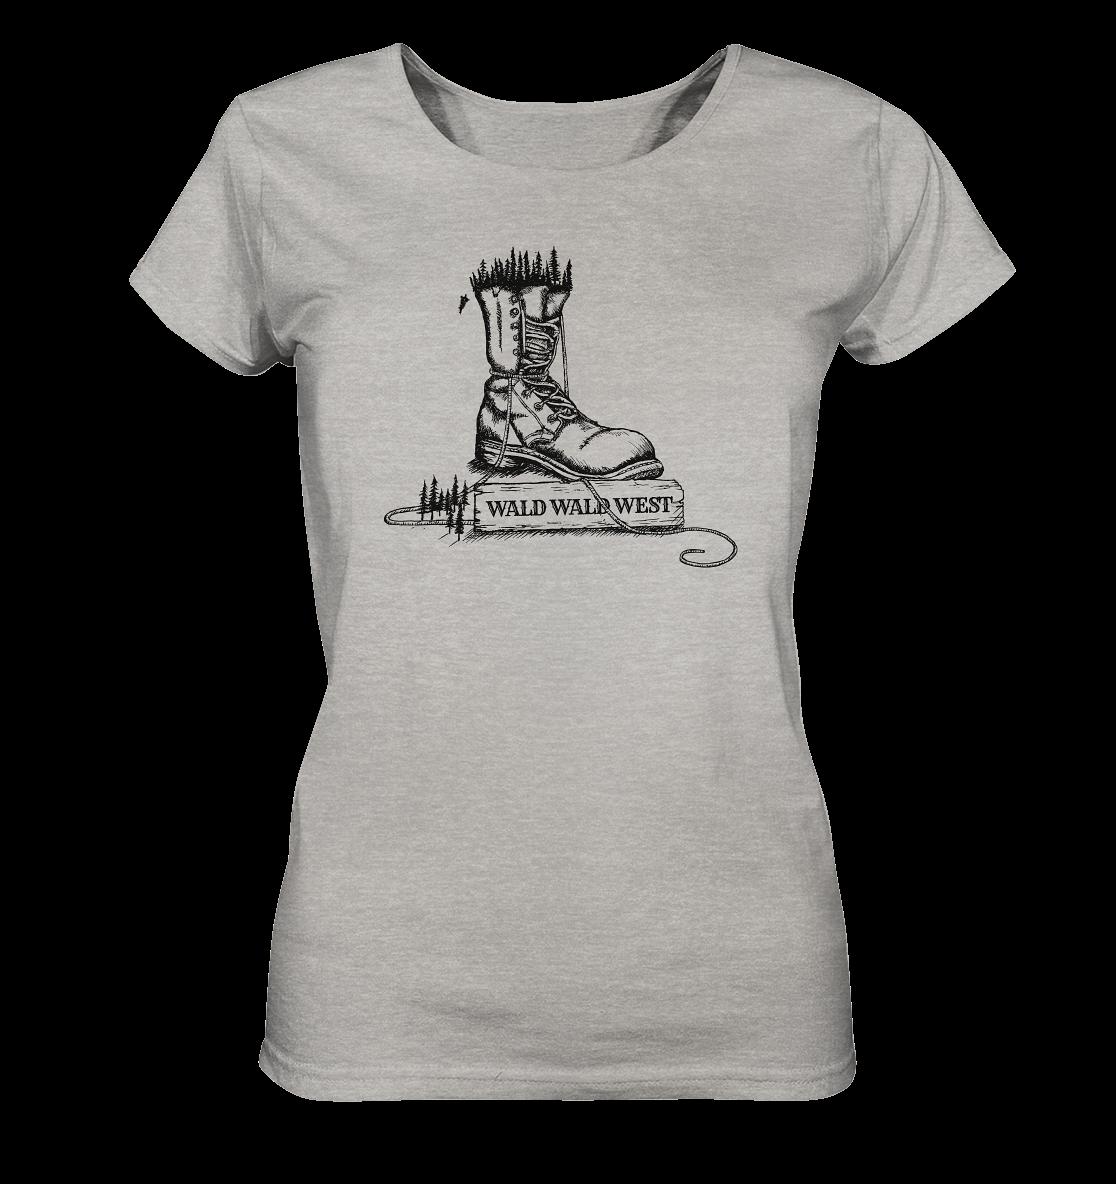 front-ladies-organic-shirt-meliert-c2c1c0-1116x-1.png